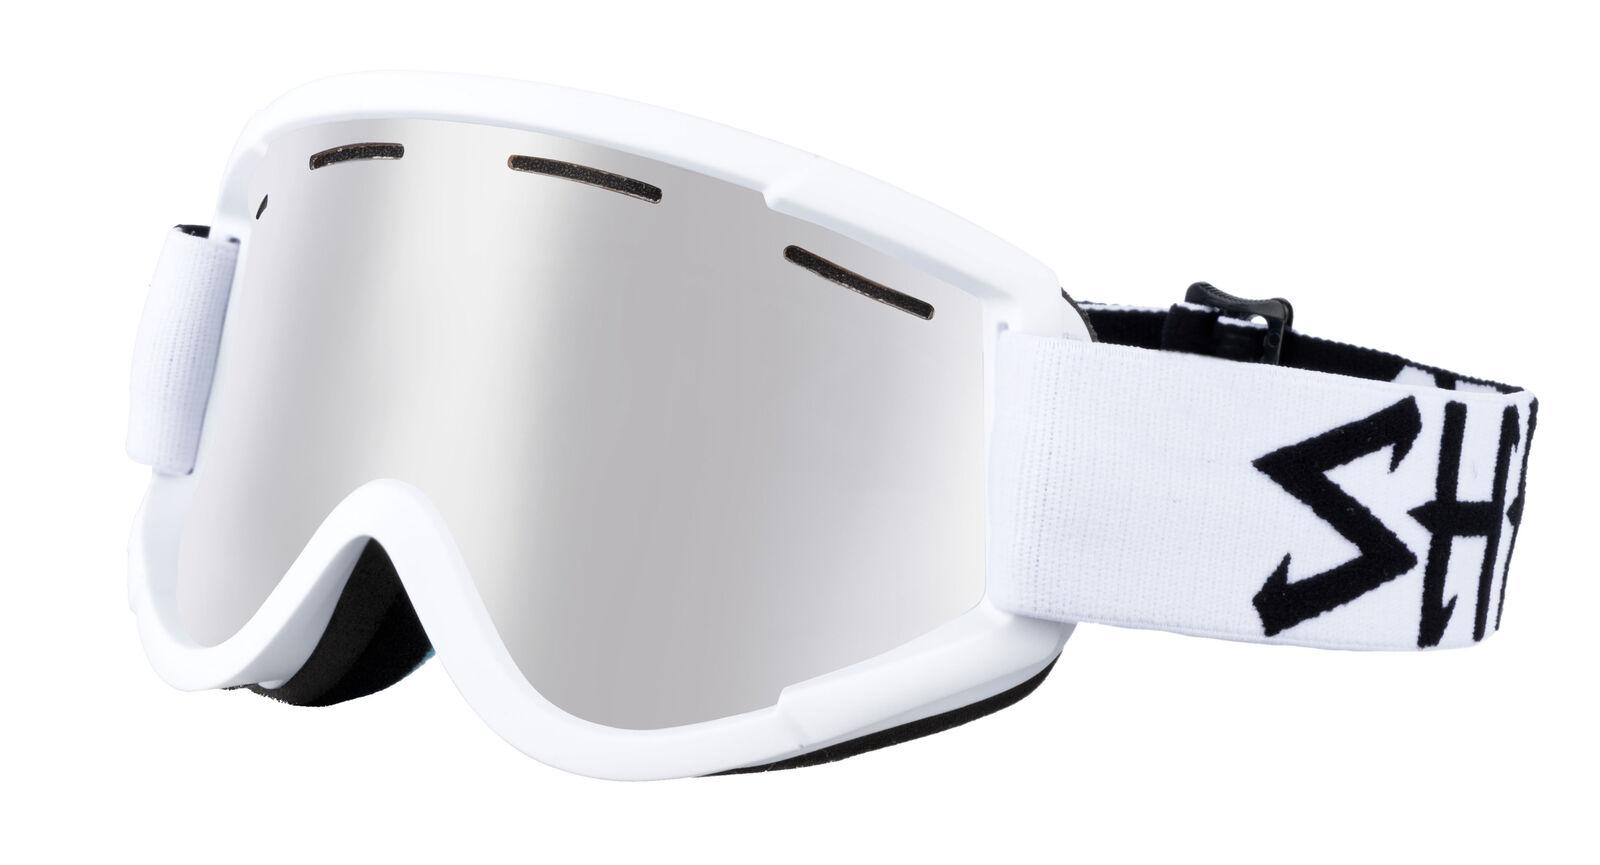 Shred Skibrille Snowboardbrille NASTIFY BLEACH PLATINUM white